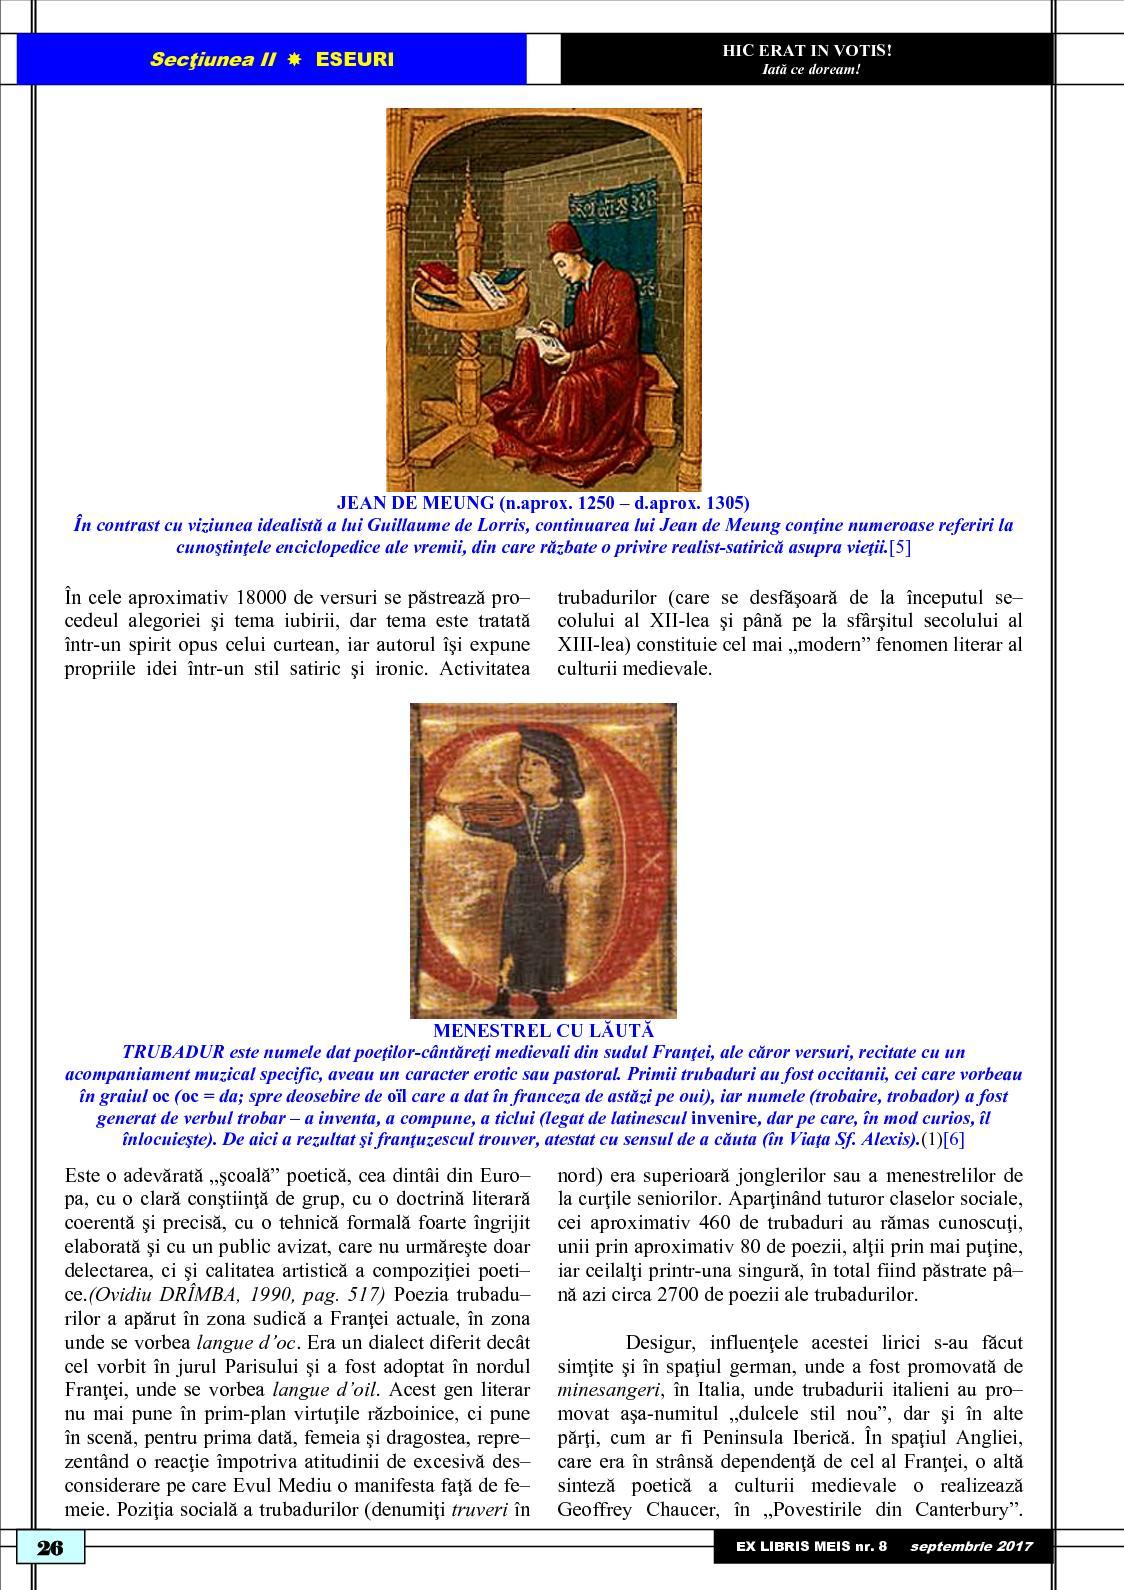 6 Comentarii Verificate pentru Apartamentul Villa Rea Di Mare | scutere-galant.ro